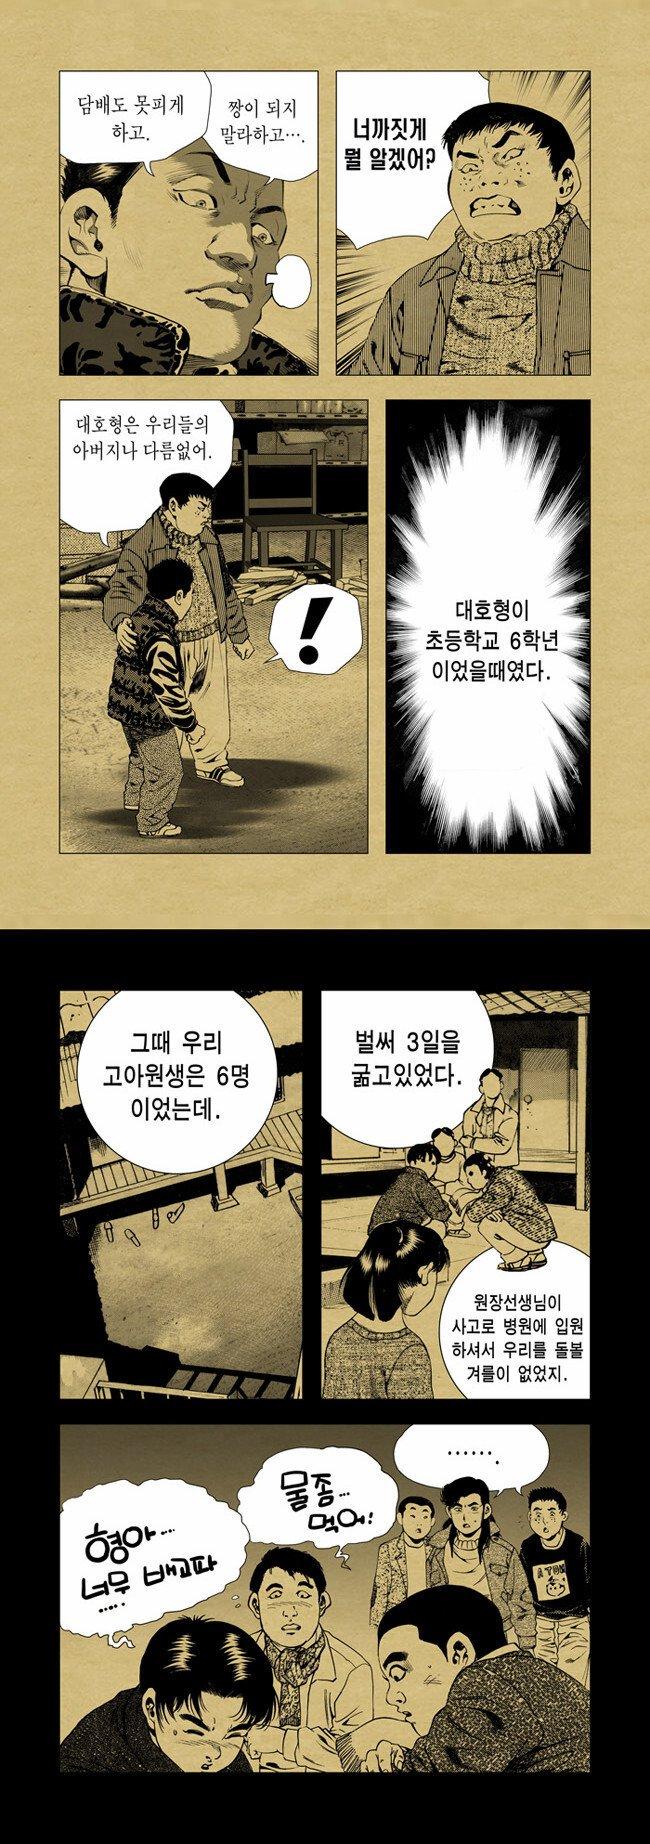 3.jpg 김성모 작품의 몰입도가 대단한 이유